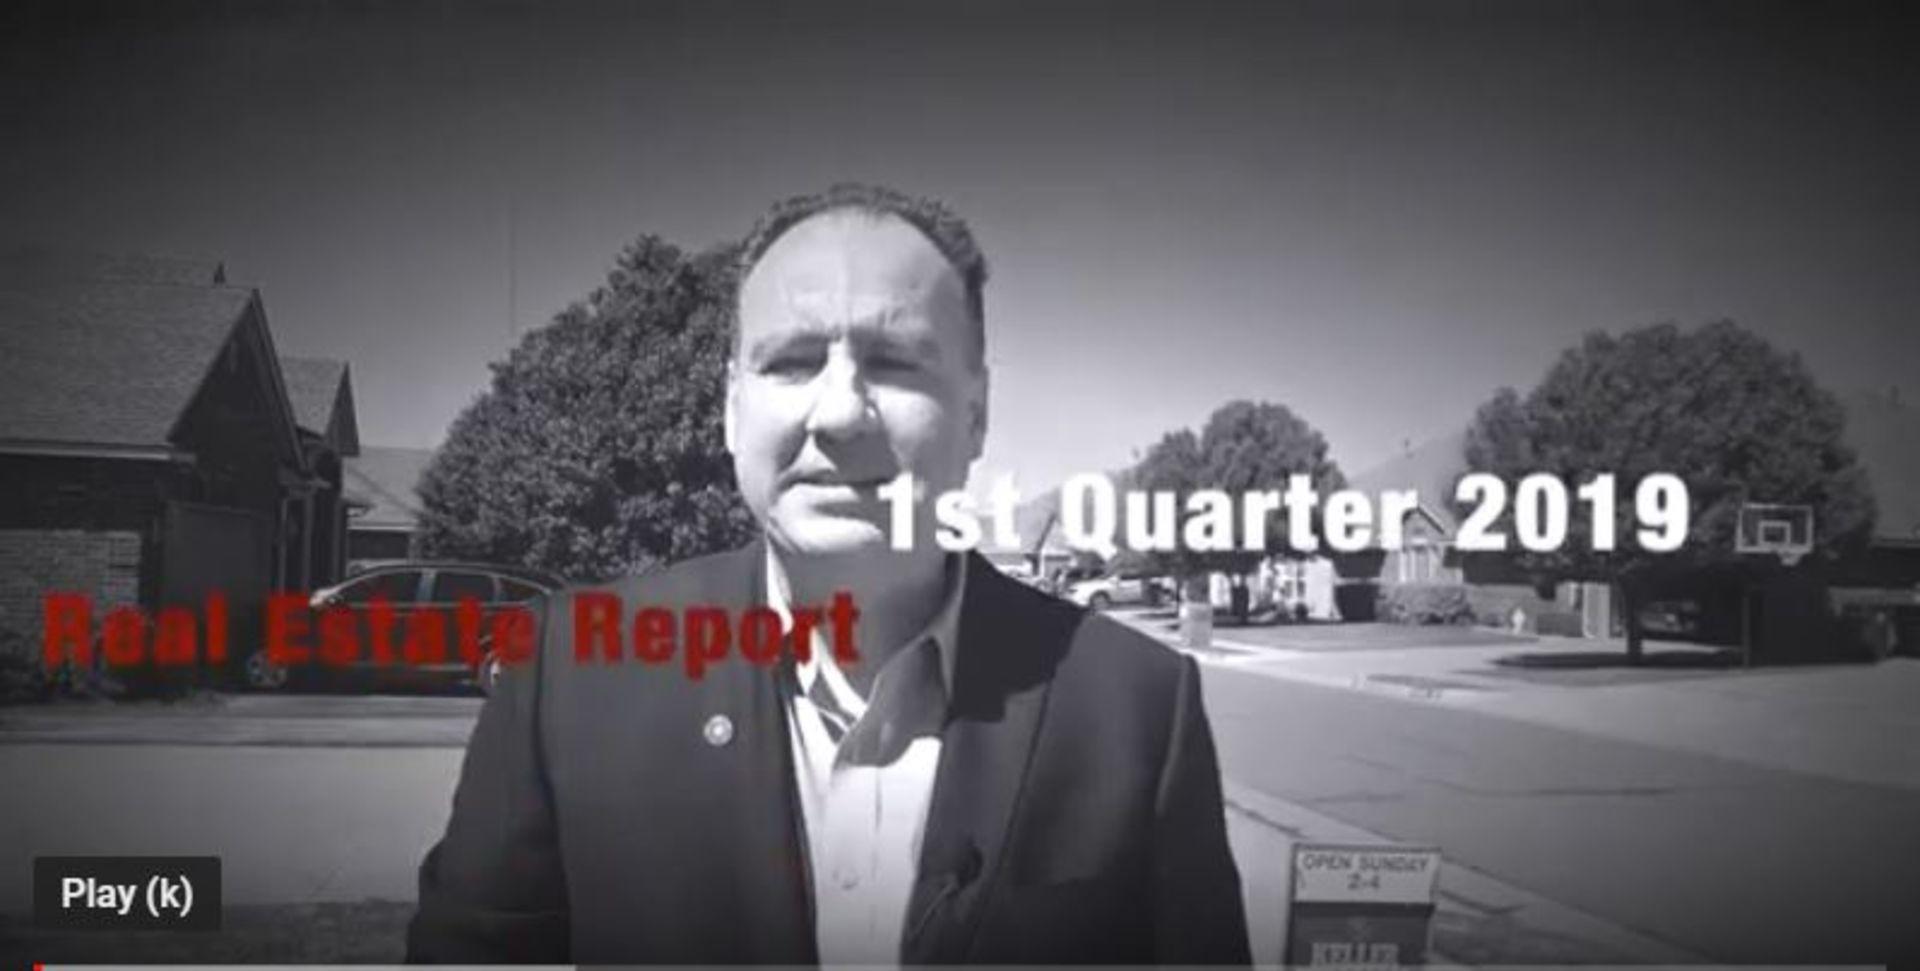 1st Quarter 2019 Real Estate Report